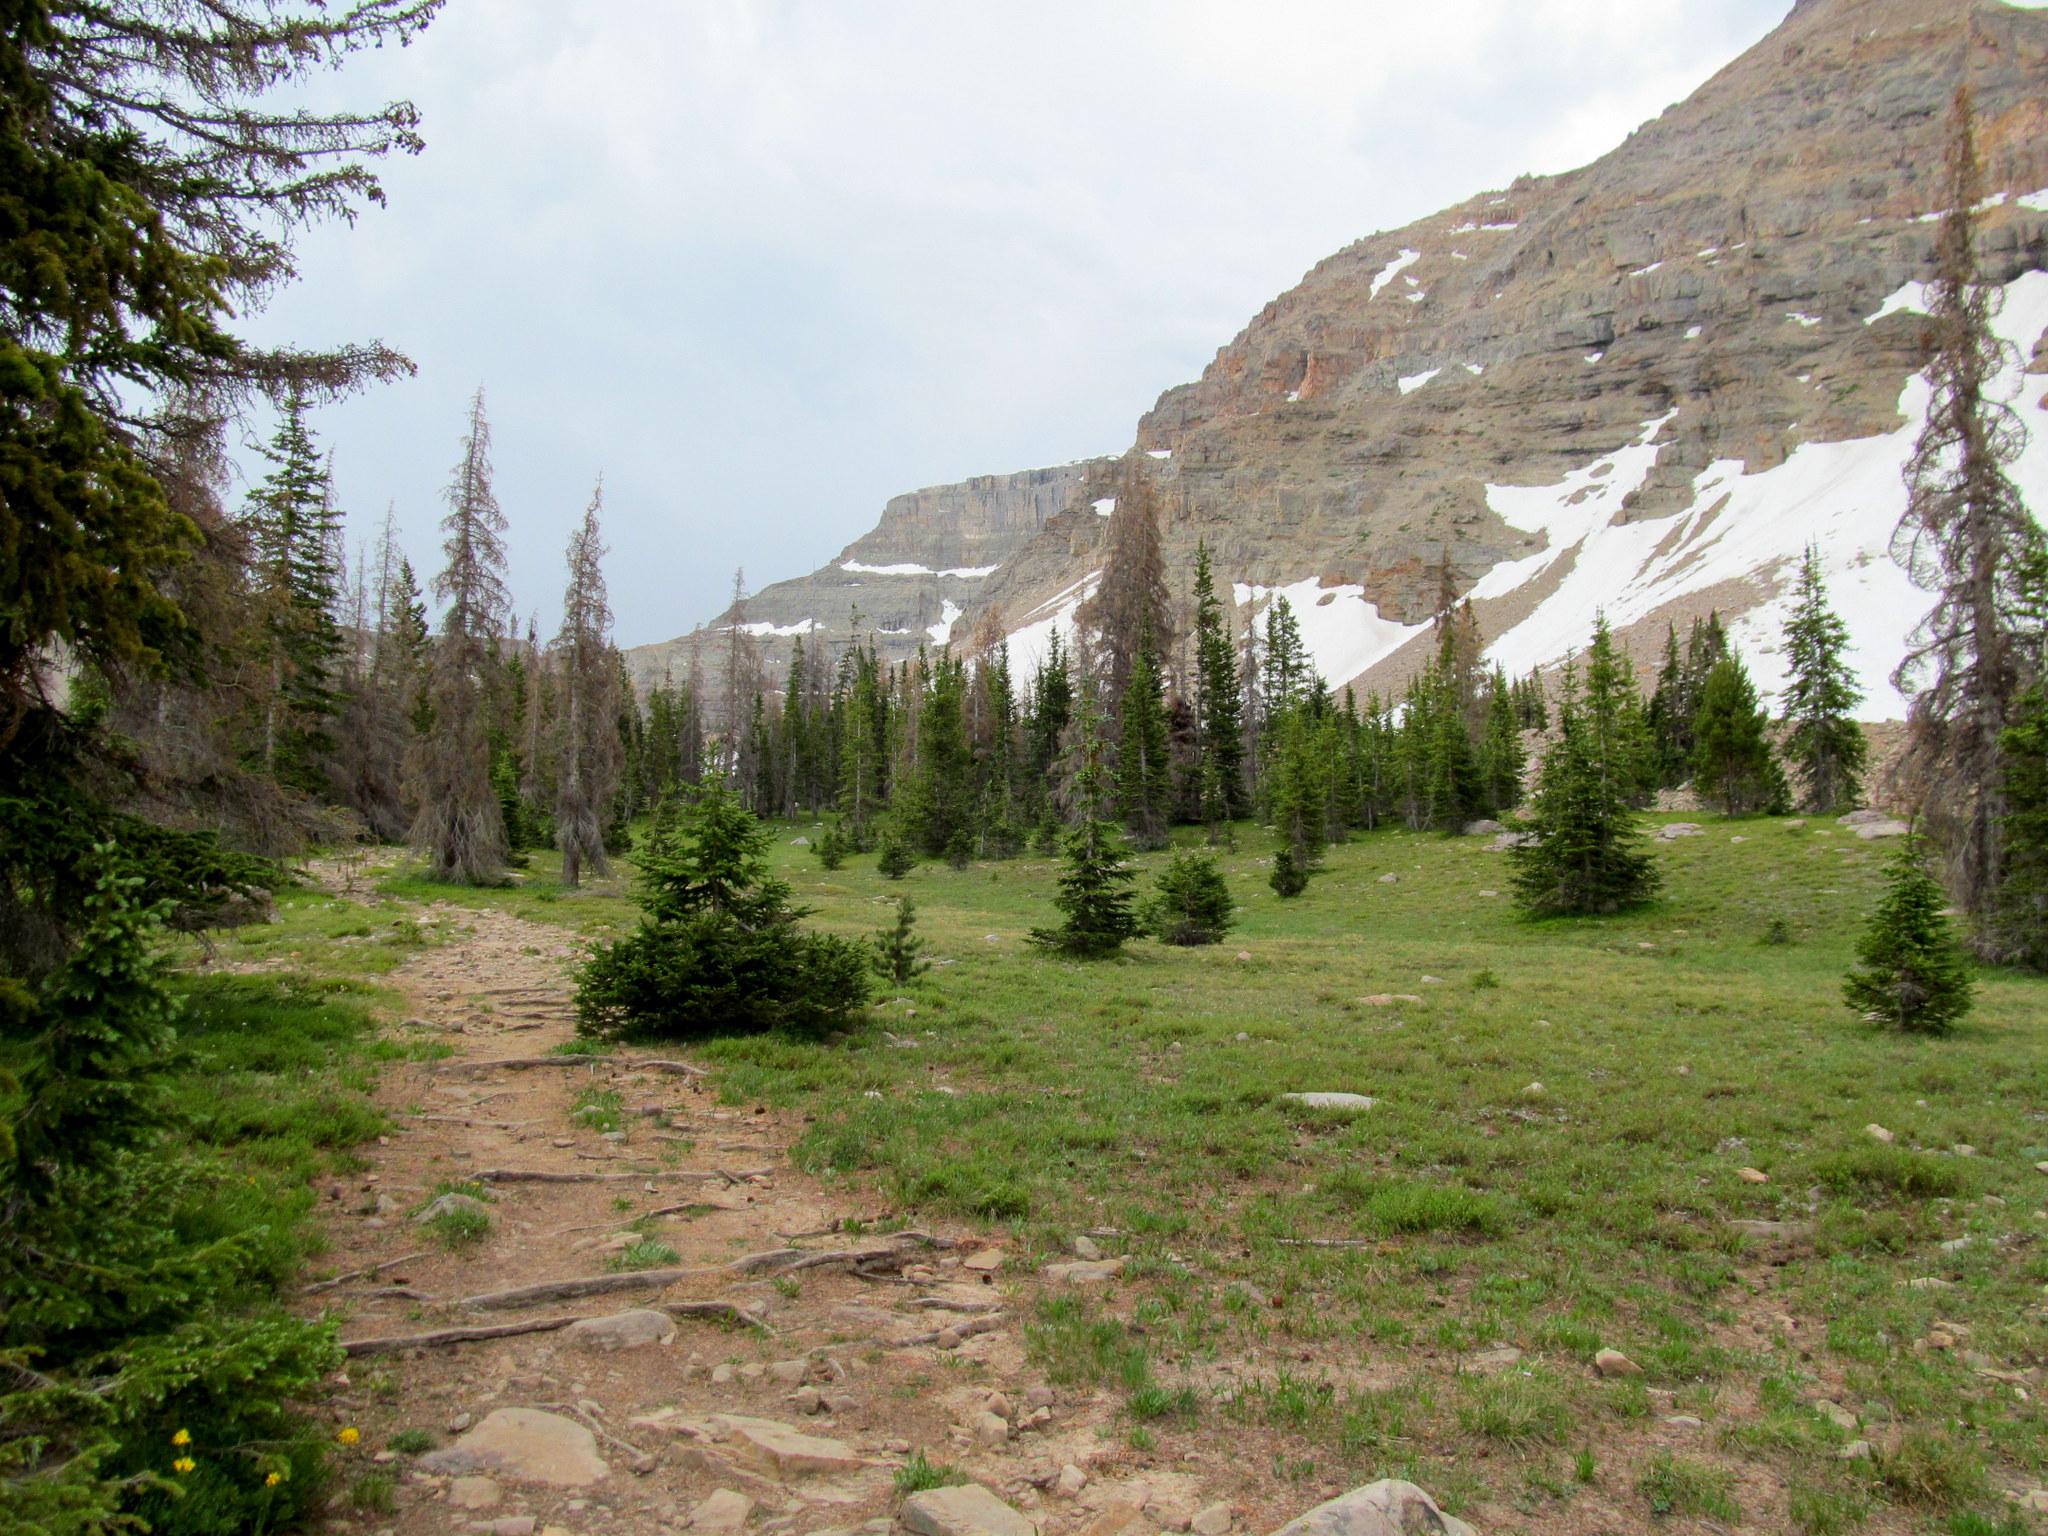 Photo: Trail to Amethyst Lake